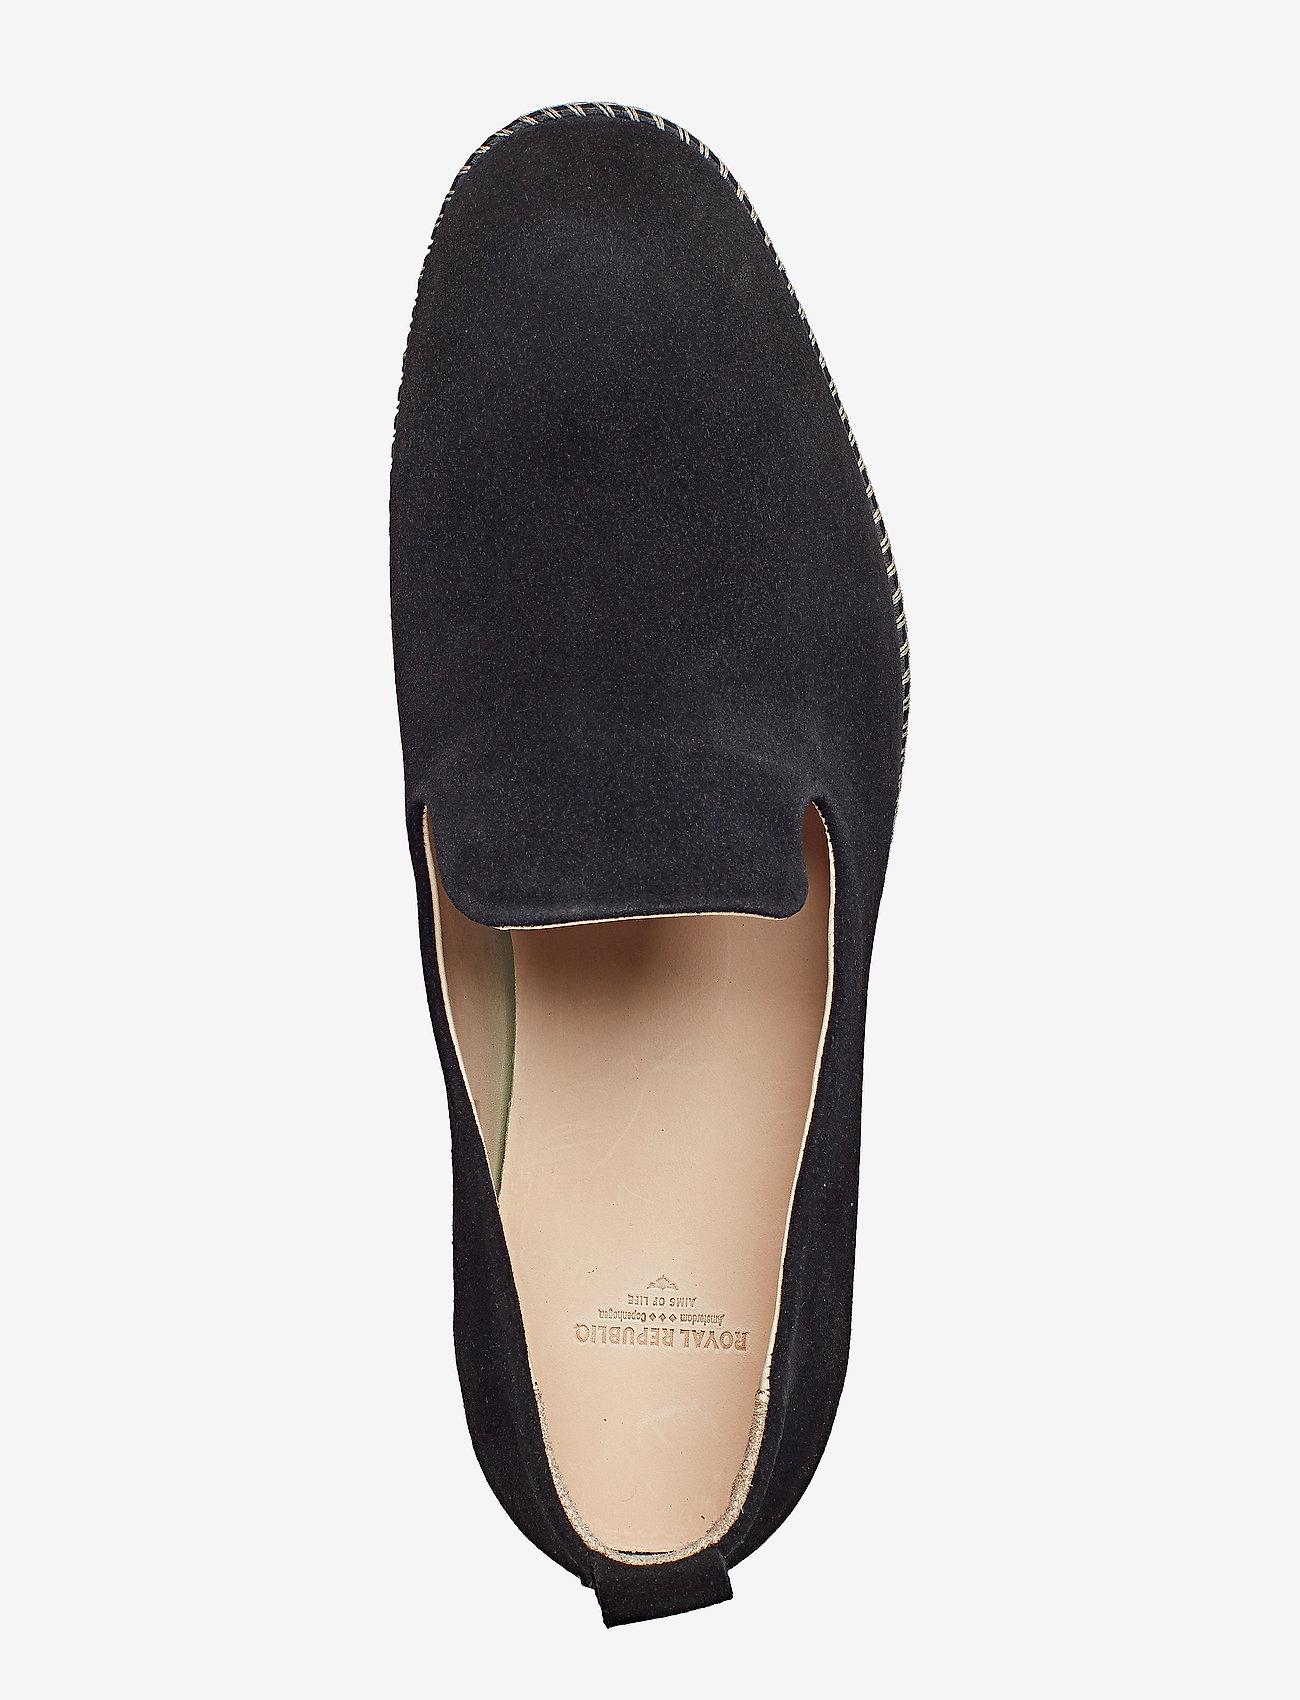 Royal RepubliQ Evo Loafer Suede - Loafers BLACK - Schuhe Billige